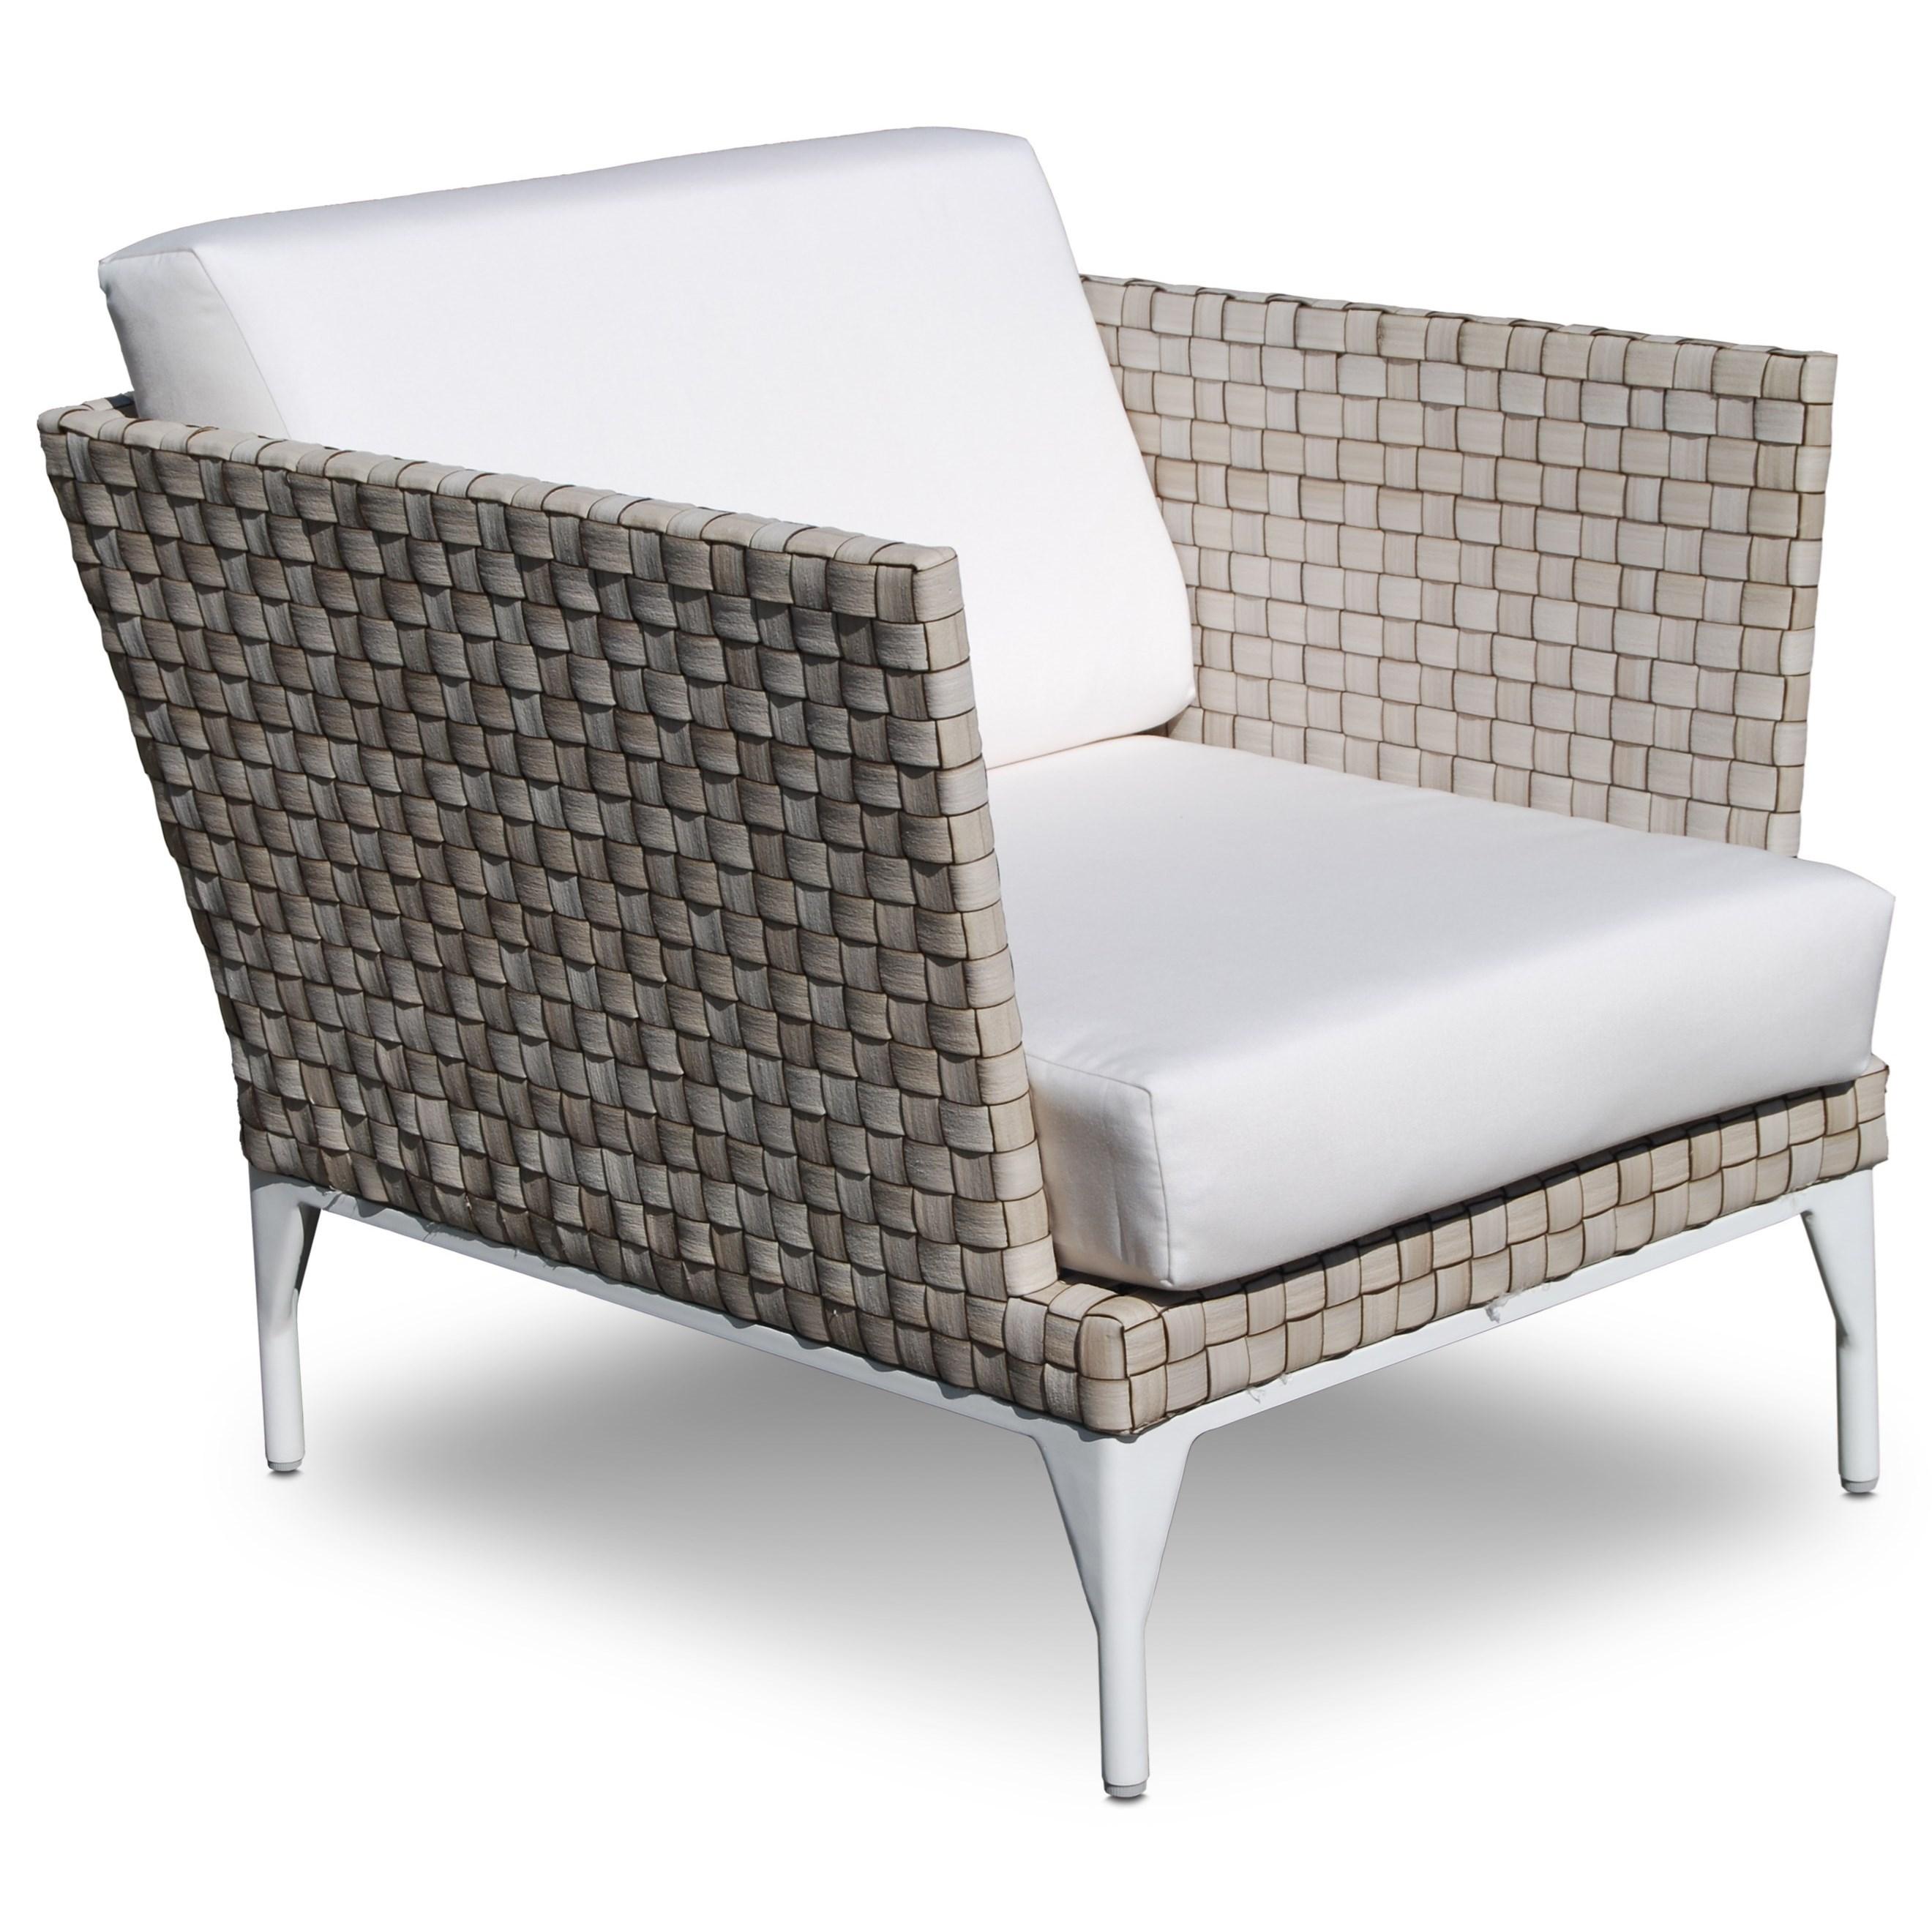 BRAFTA Outdoor Armchair by Skyline Design at Baer's Furniture